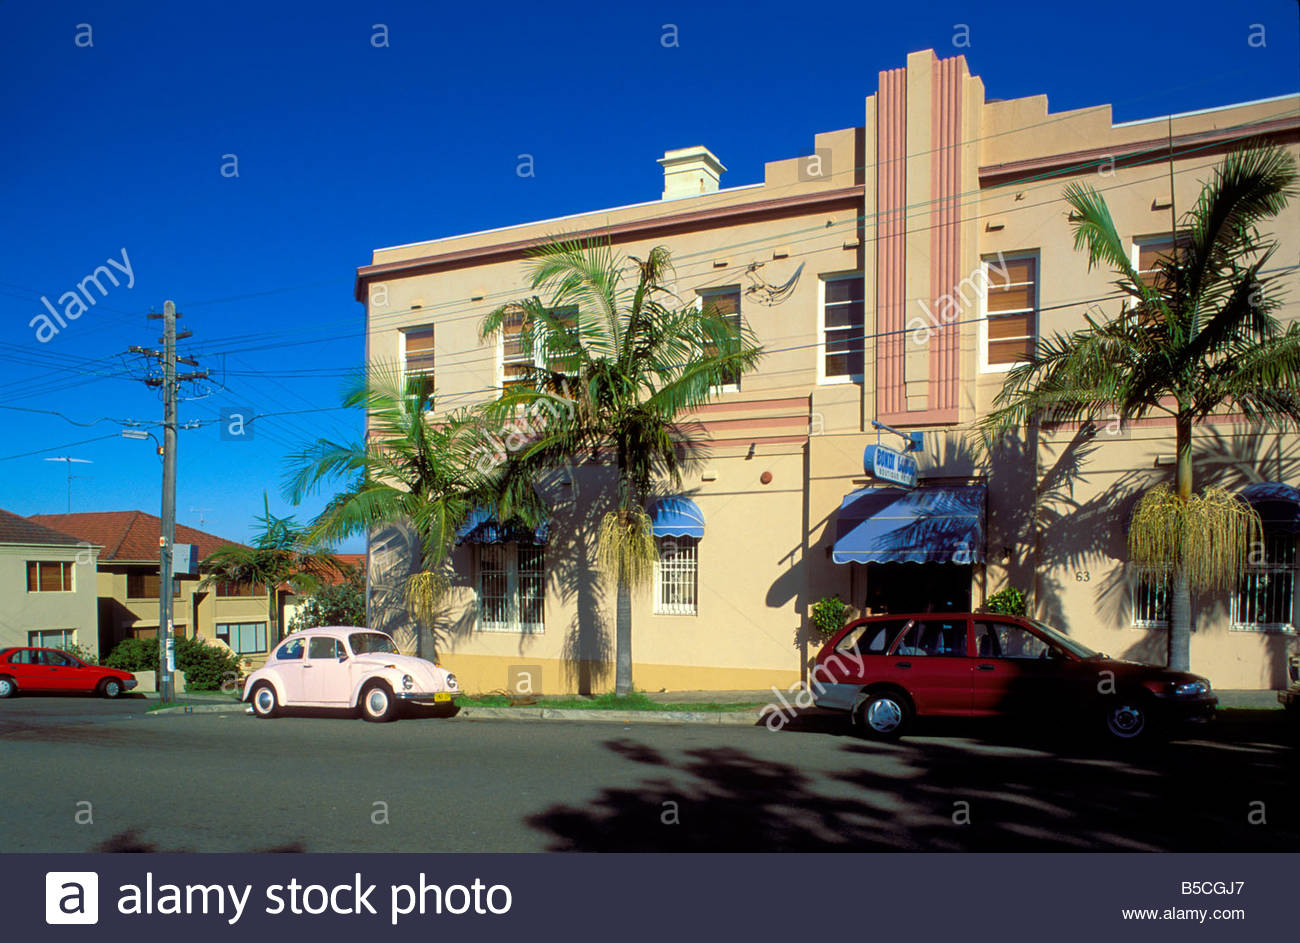 Bondi Hotel Bondi Beach Australia Holidays Stock Photos